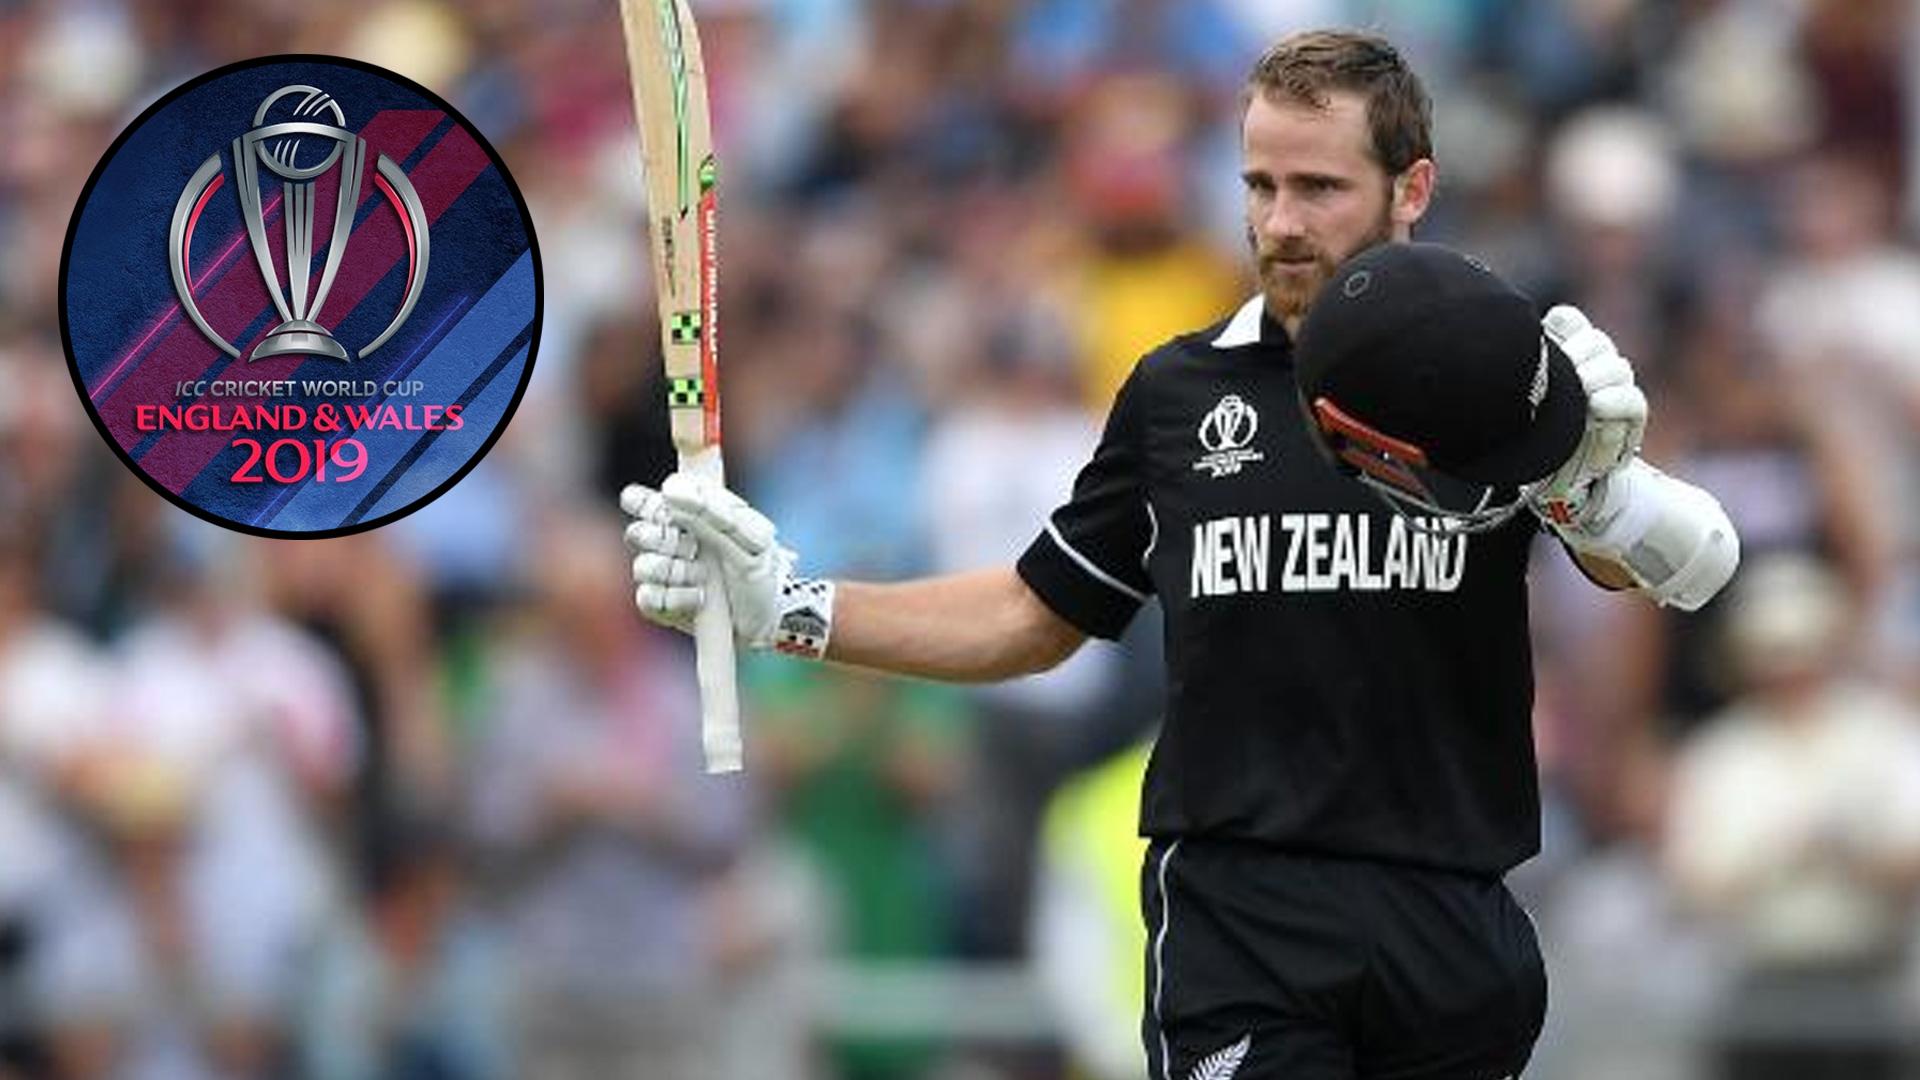 ICC World Cup 2019 Final:Williamson Breaks Jayawardene World Record In World Cup Final Match